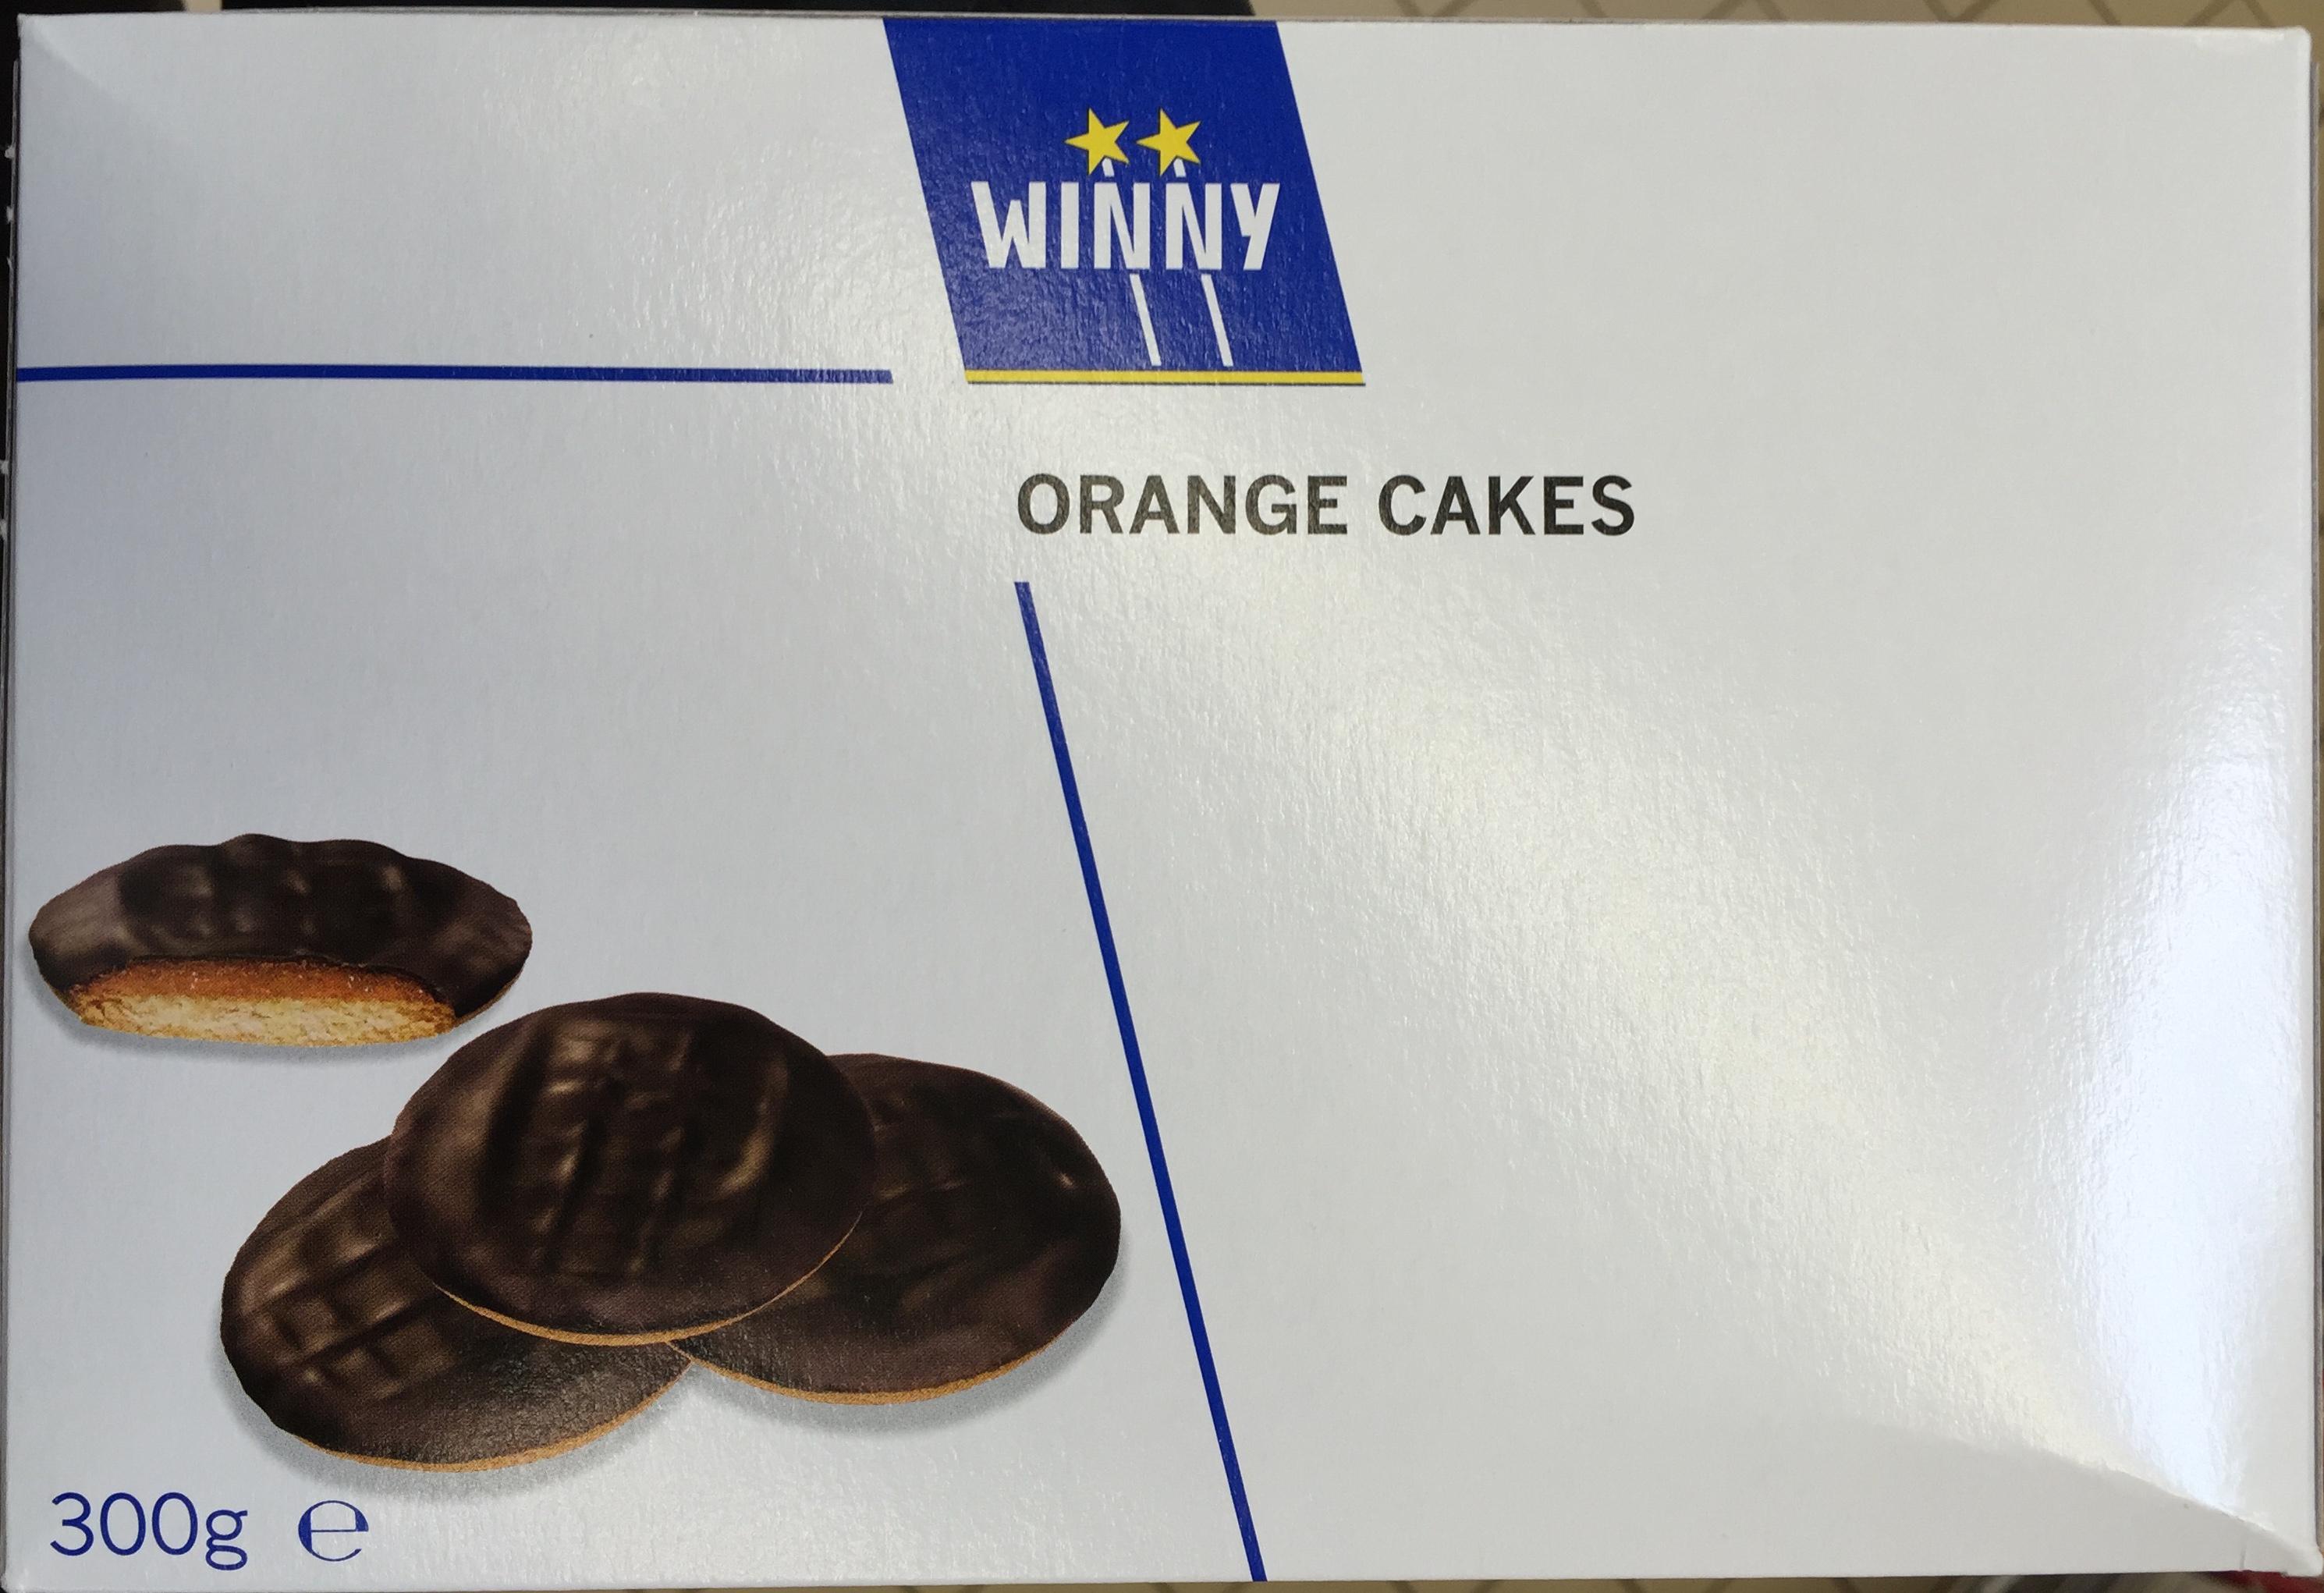 Orange Cakes - Product